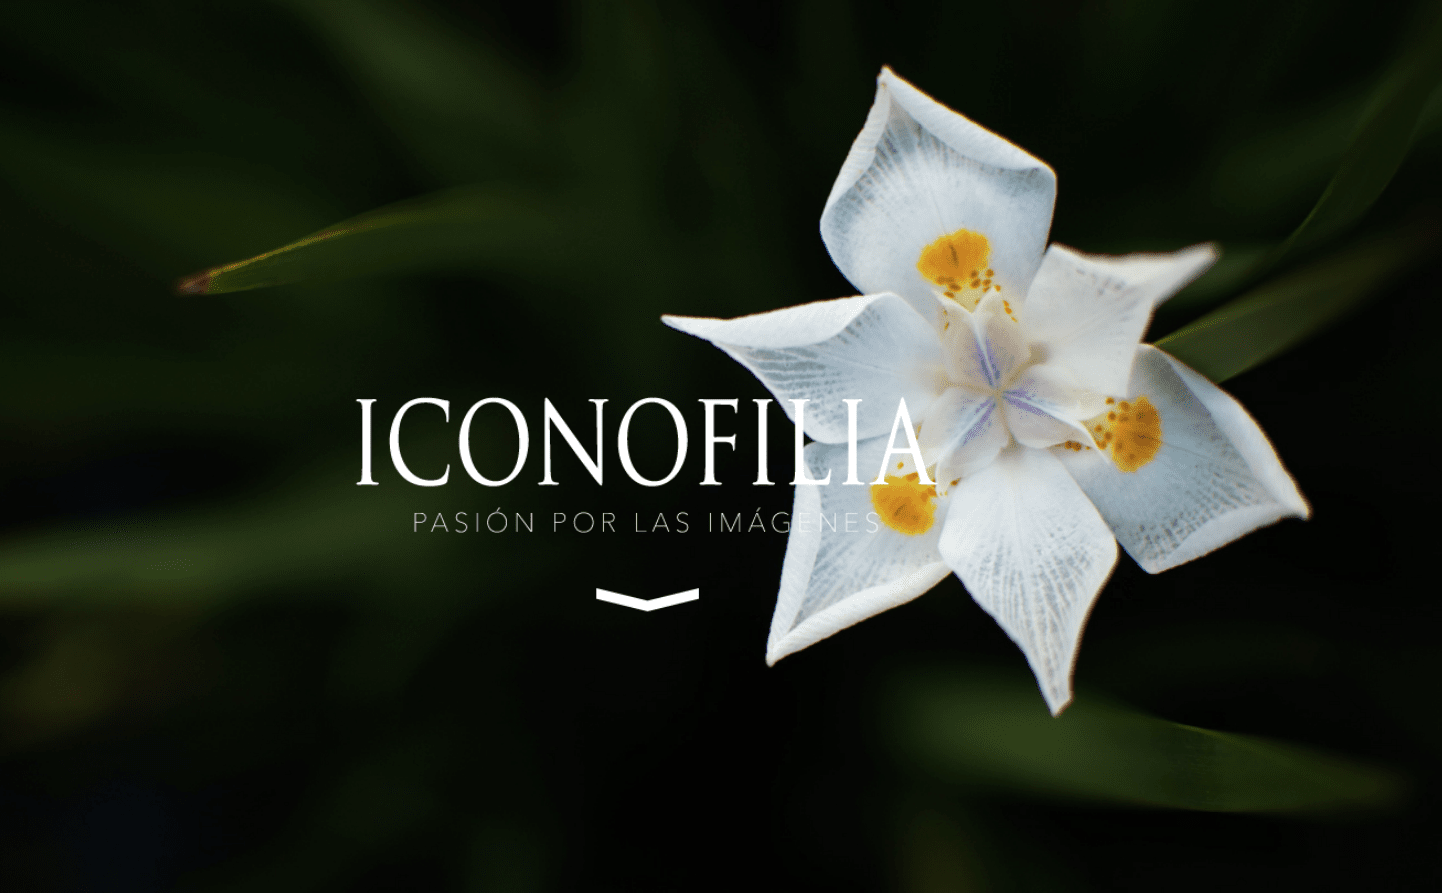 Iconofilia